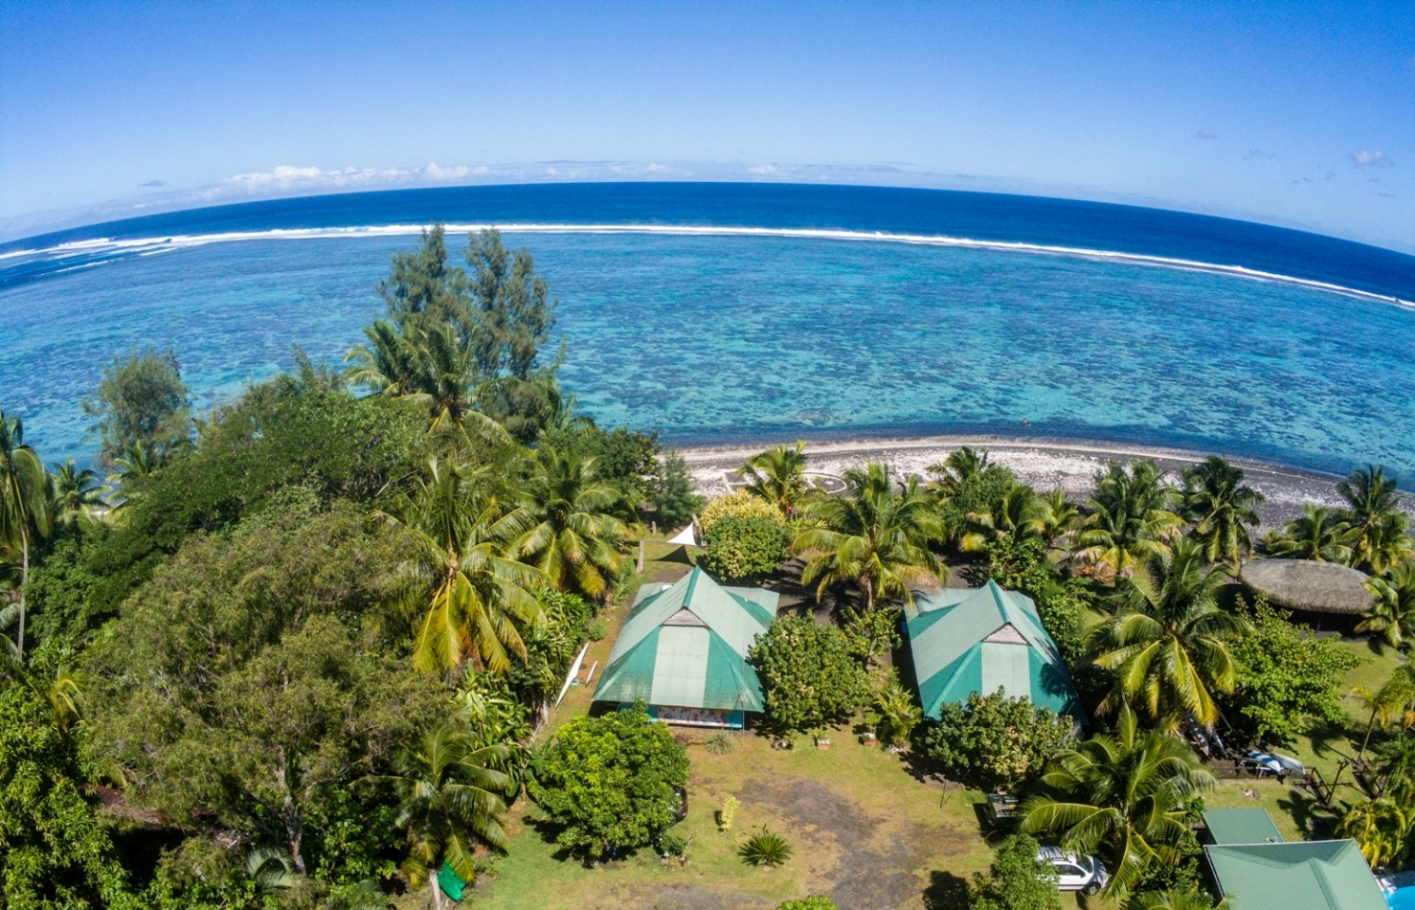 https://tahititourisme.fr/wp-content/uploads/2019/08/copie-Tahiti-tourisme-948ko.jpg